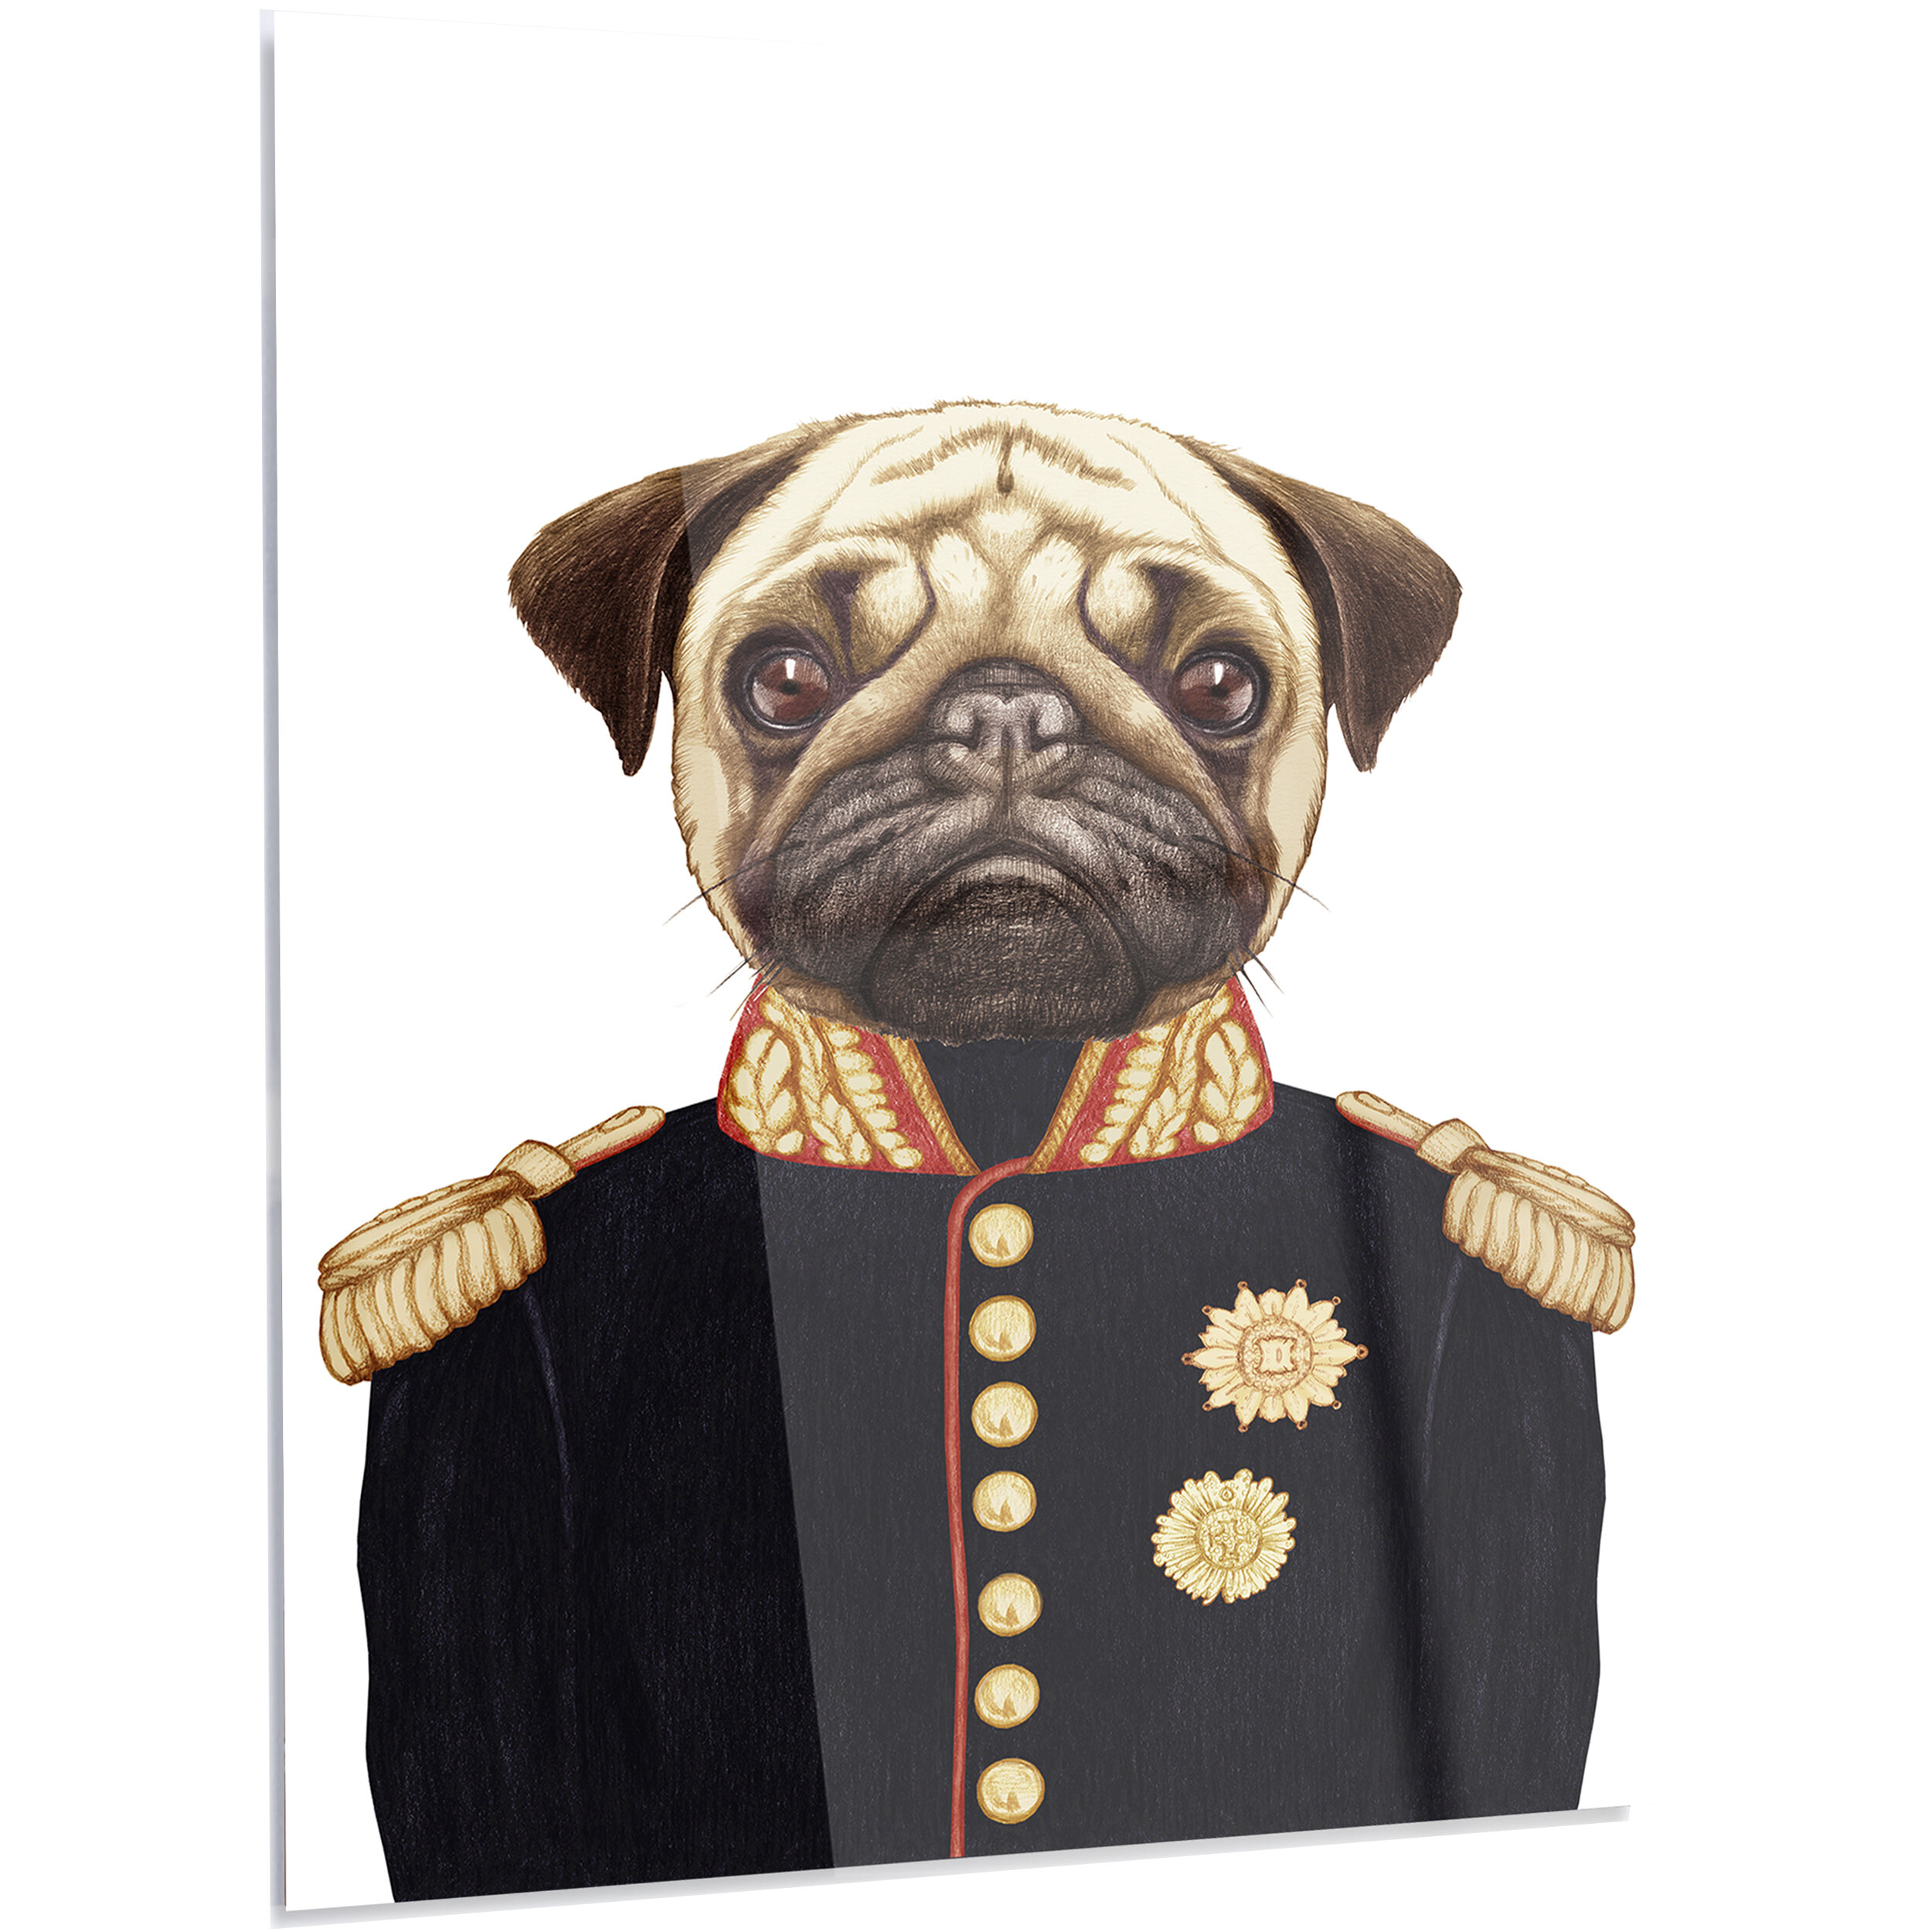 Designart Funny Pug Dog In Military Uniform Graphic Art